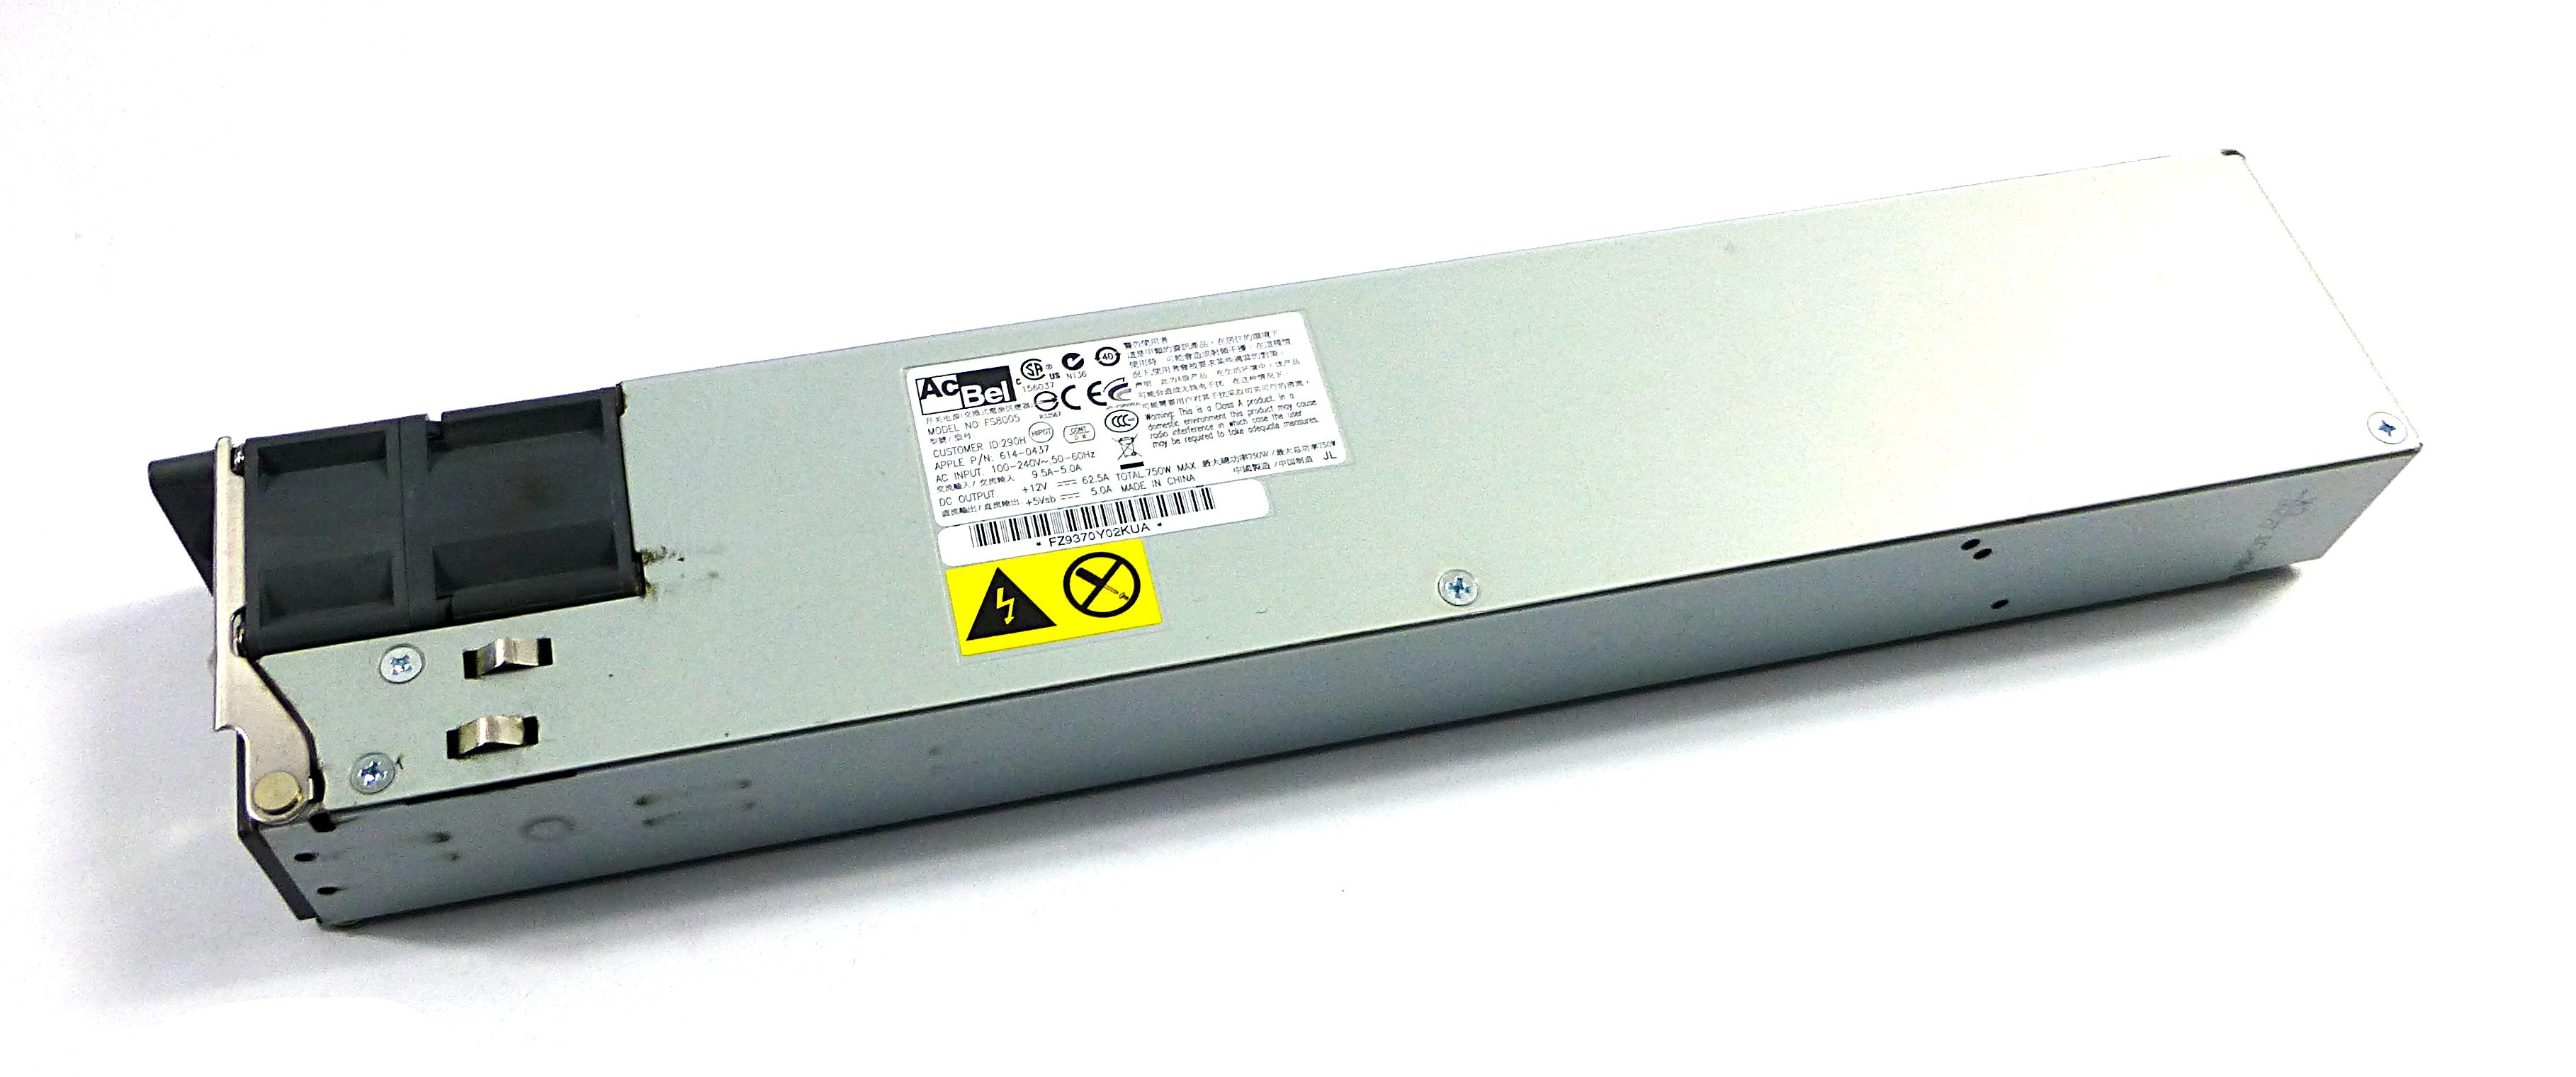 Apple 614-0437 XServe Model: A1279(2009) 750W Power Supply - AcBel FS8005